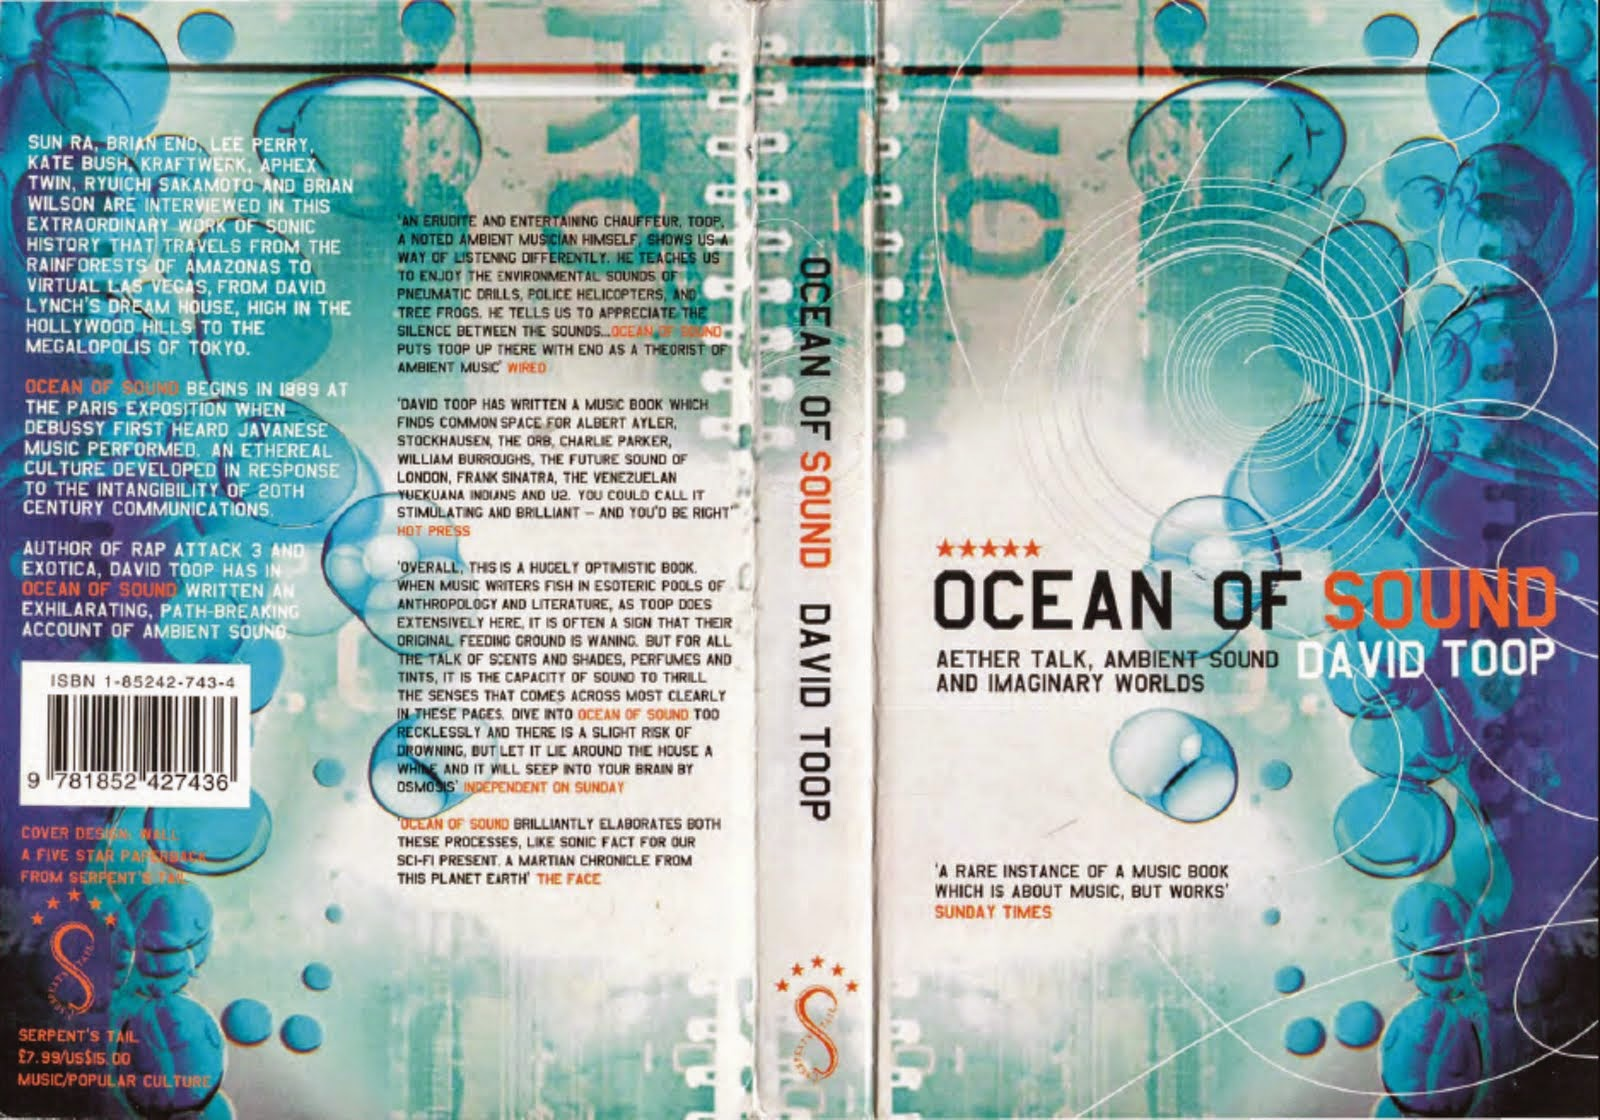 Deep Art Nature: Ocean of Sound - David Toop (1995)